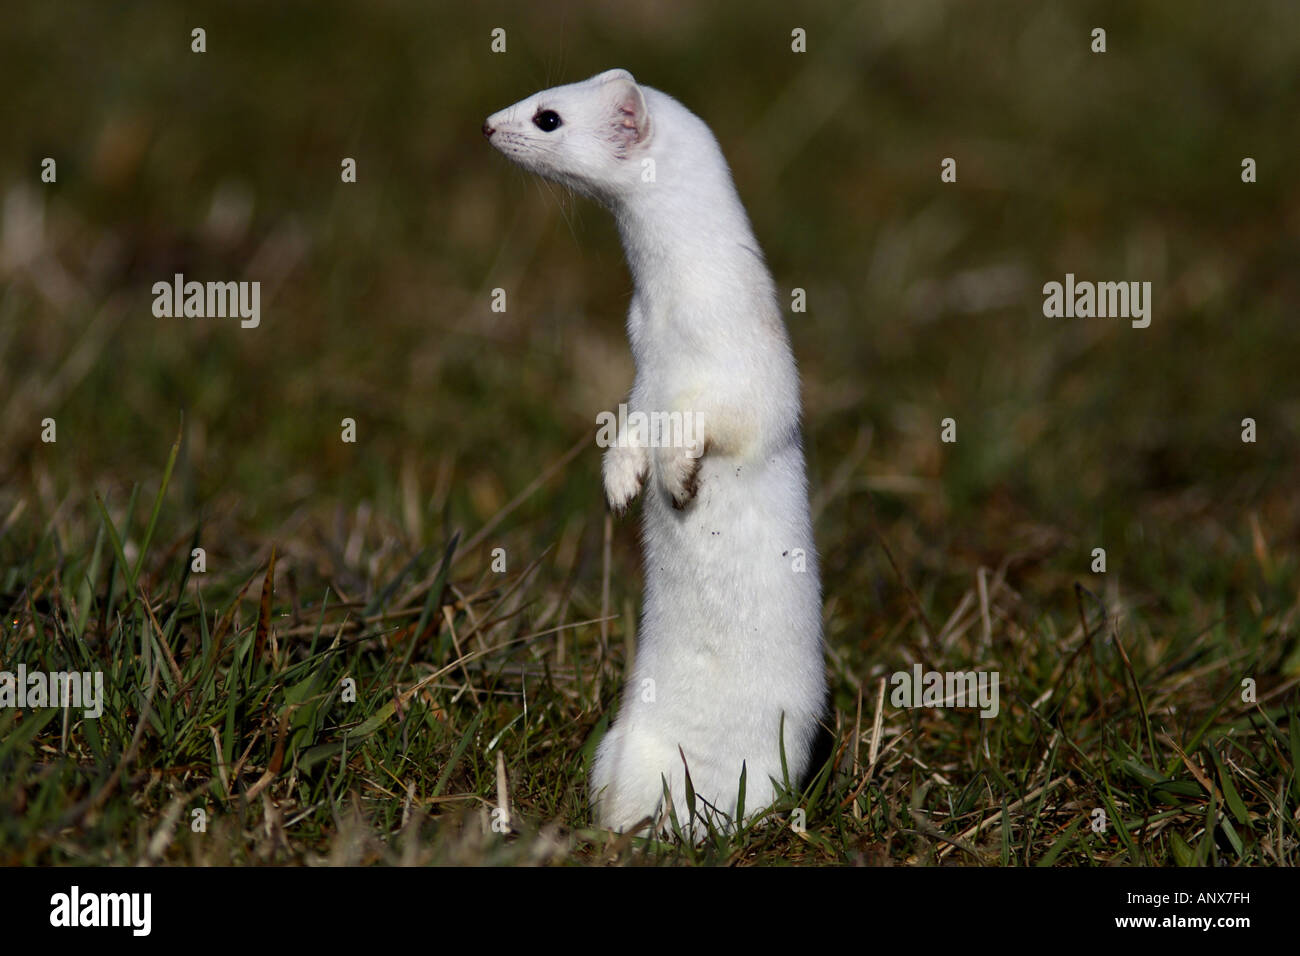 ermine, stoat (Mustela erminea), winter fur, Germany Stock